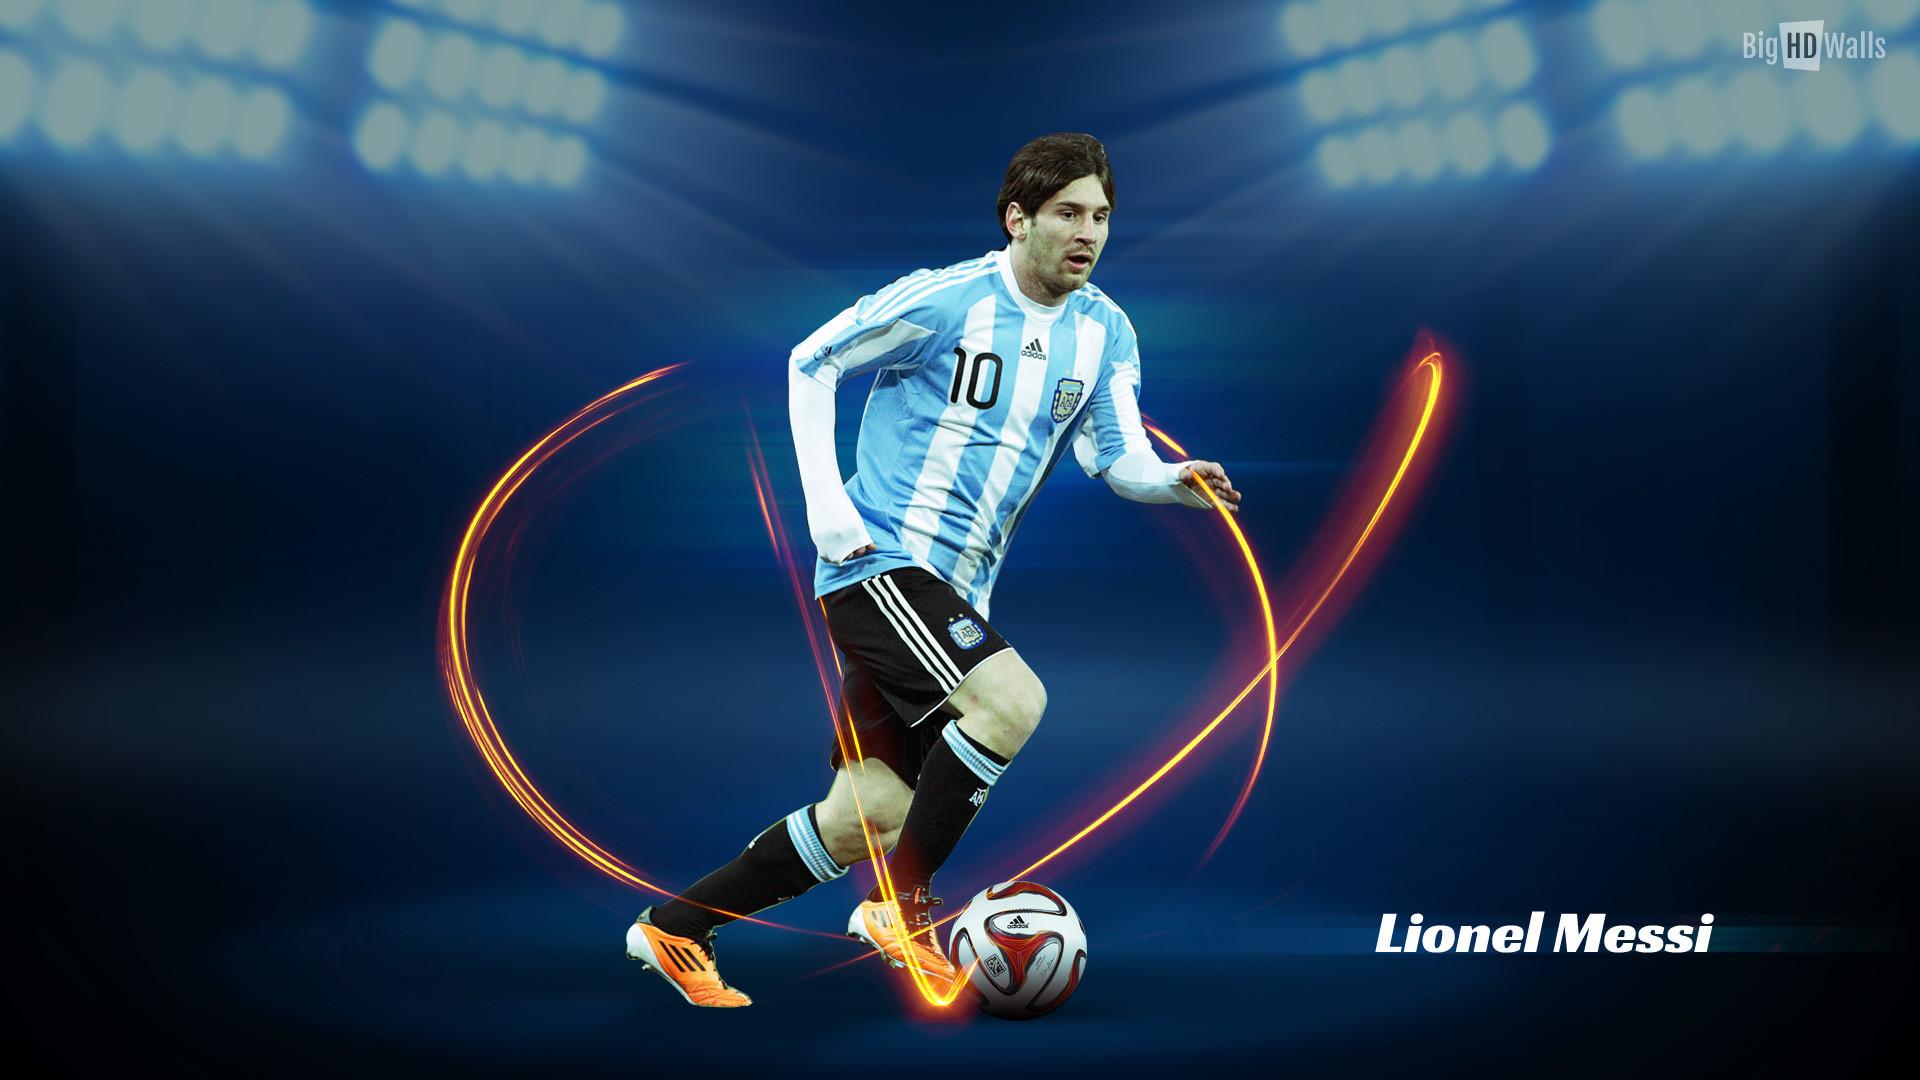 1920x1080 Lionel Messi Wallpaper 2017